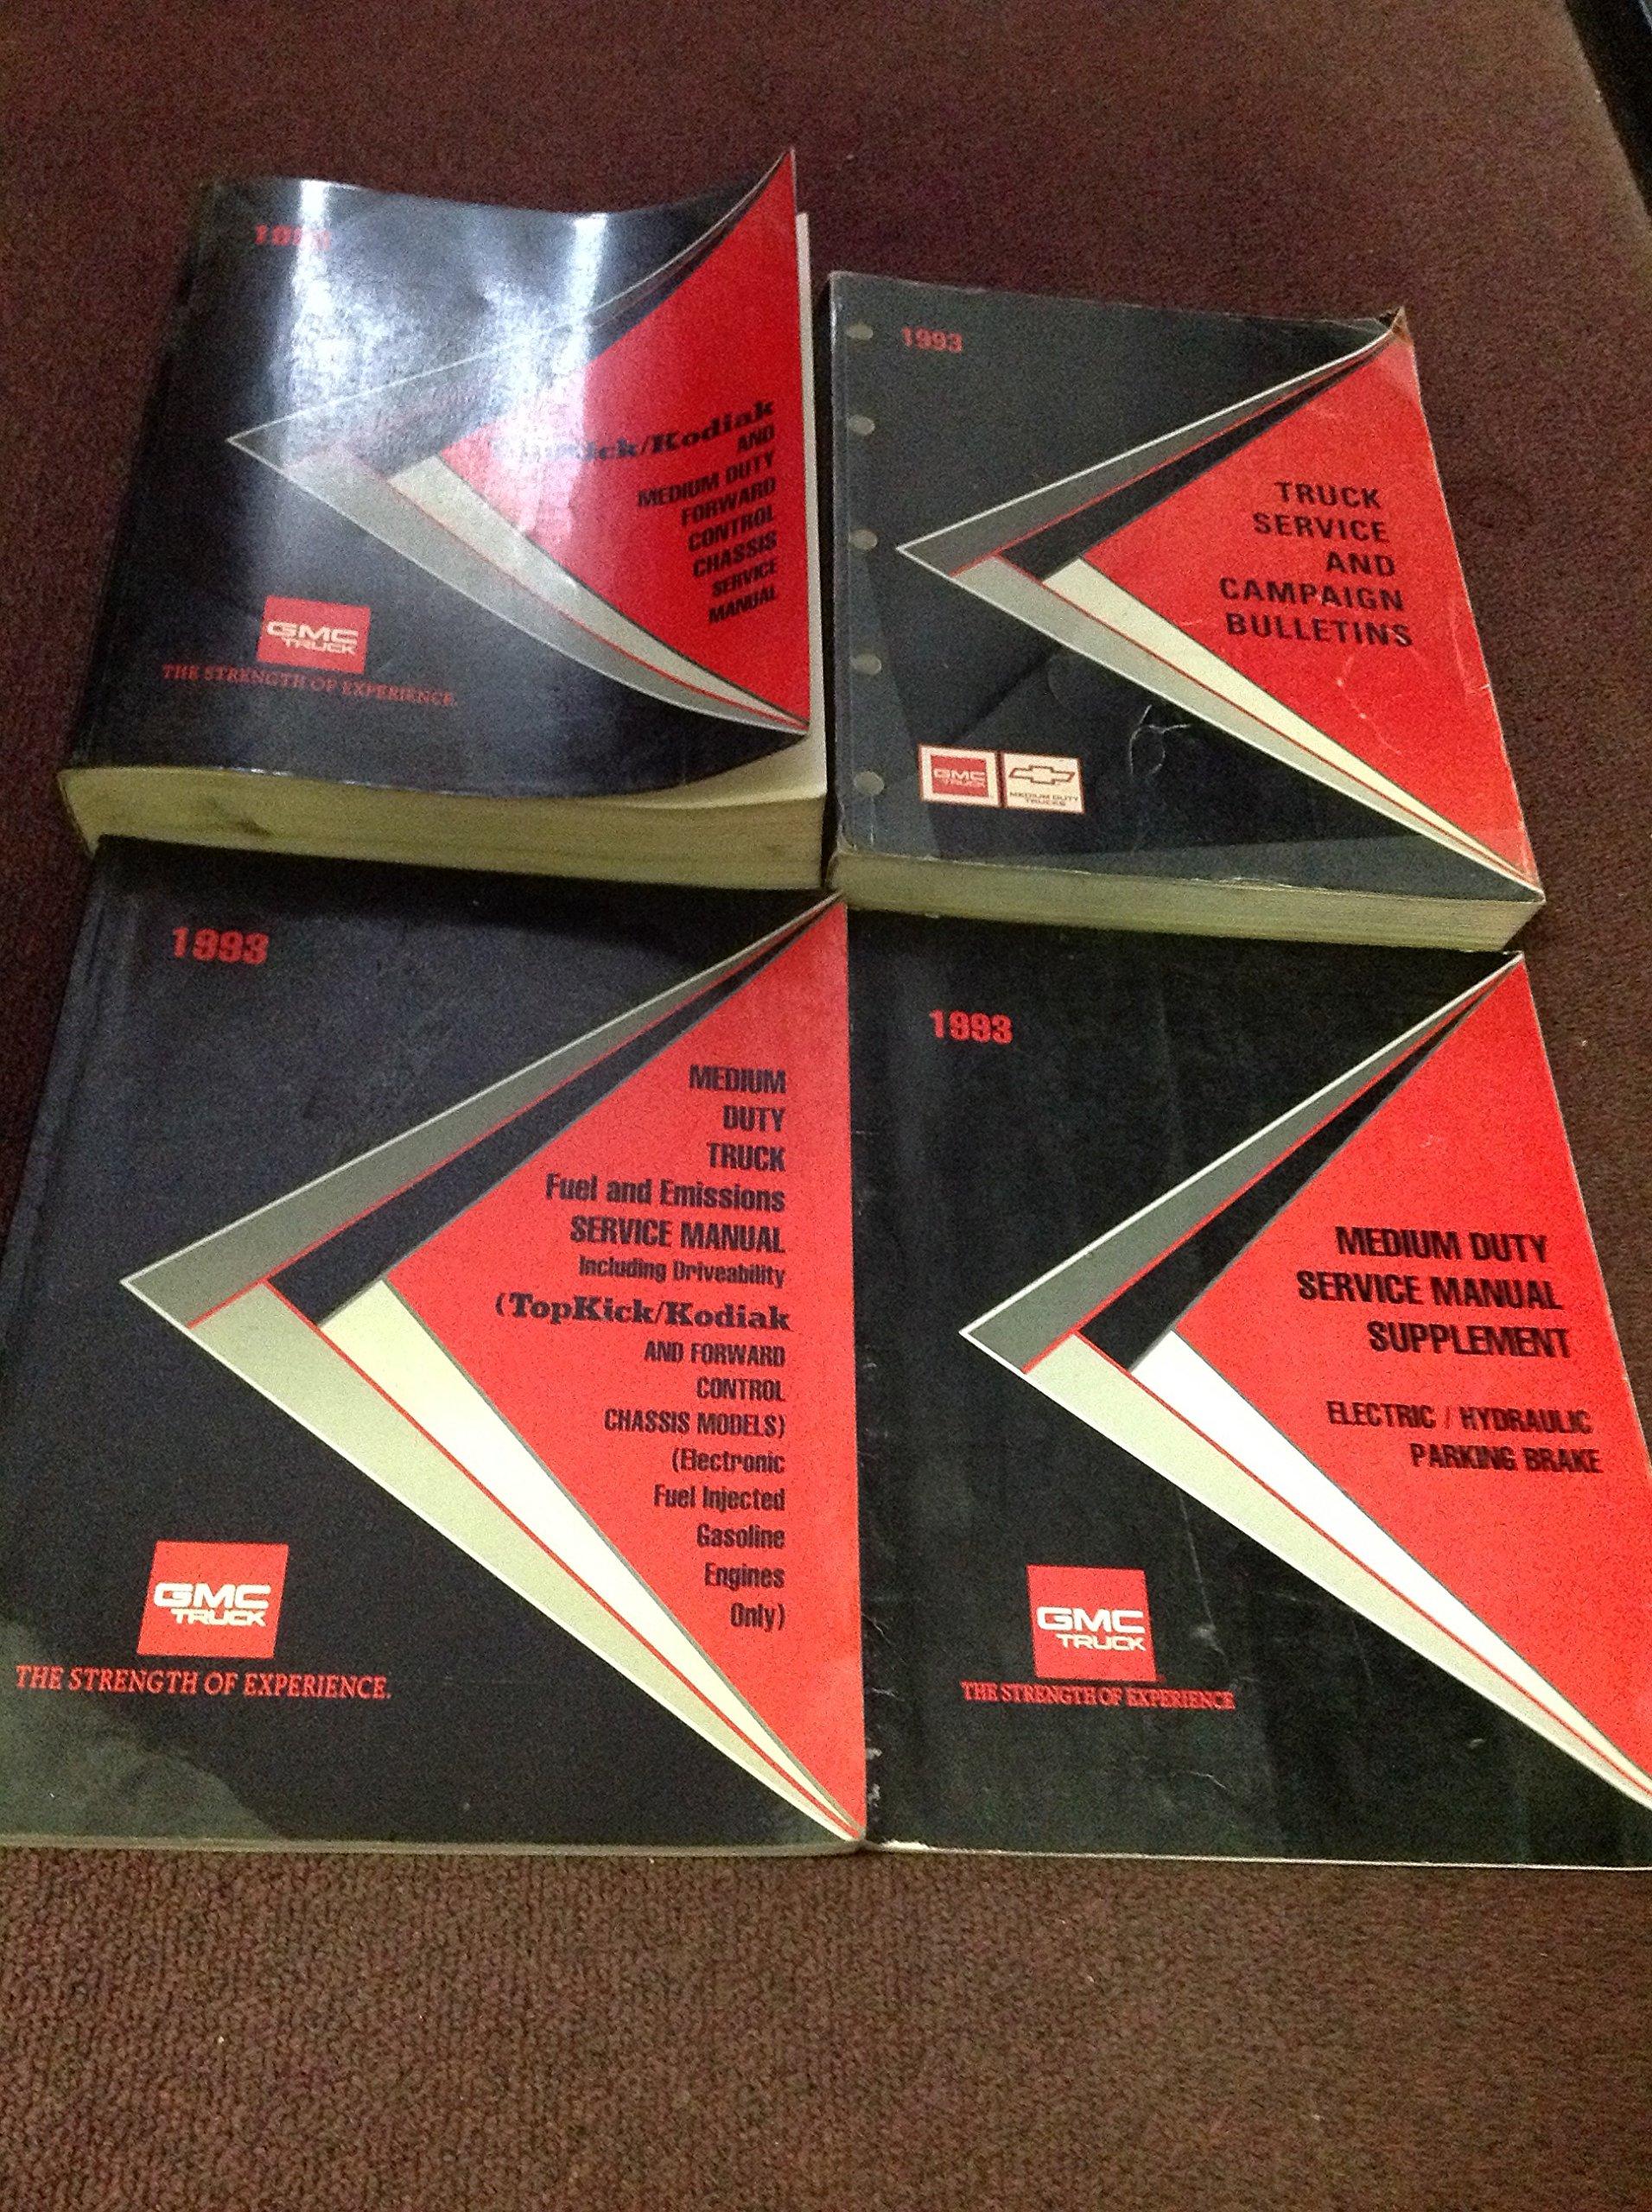 1993 GMC Topkick Chevy Kodiak Diesel Shop Service Repair Manual Set FACTORY  OEM: gmc: Amazon.com: Books